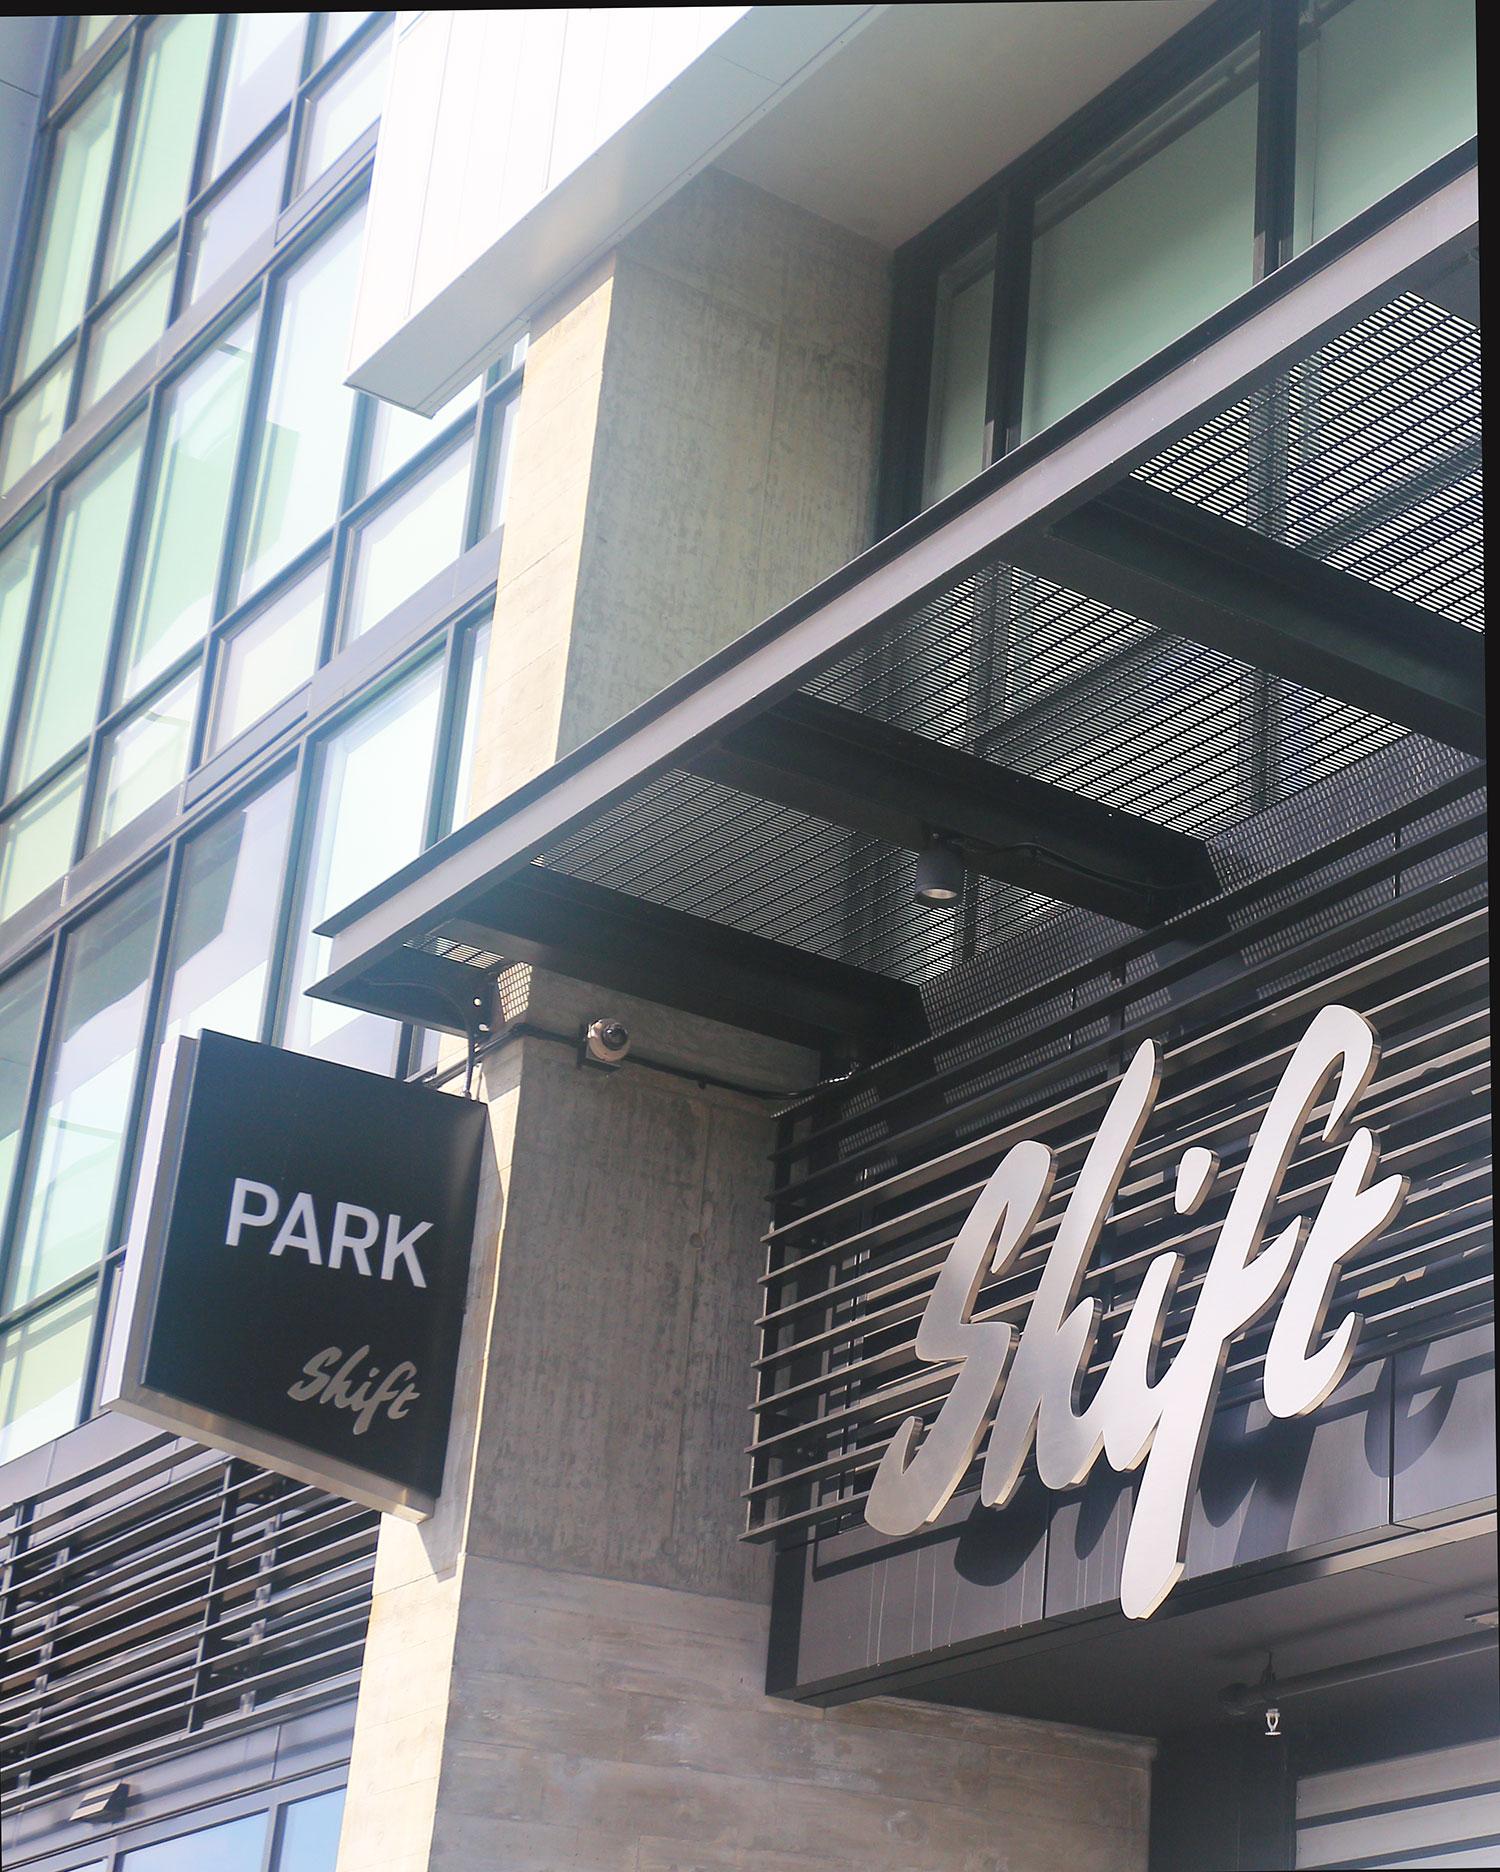 miriello-grafico_SHIFT-San-Diego-East-Village-Downtown-apartment-branding-28.jpg